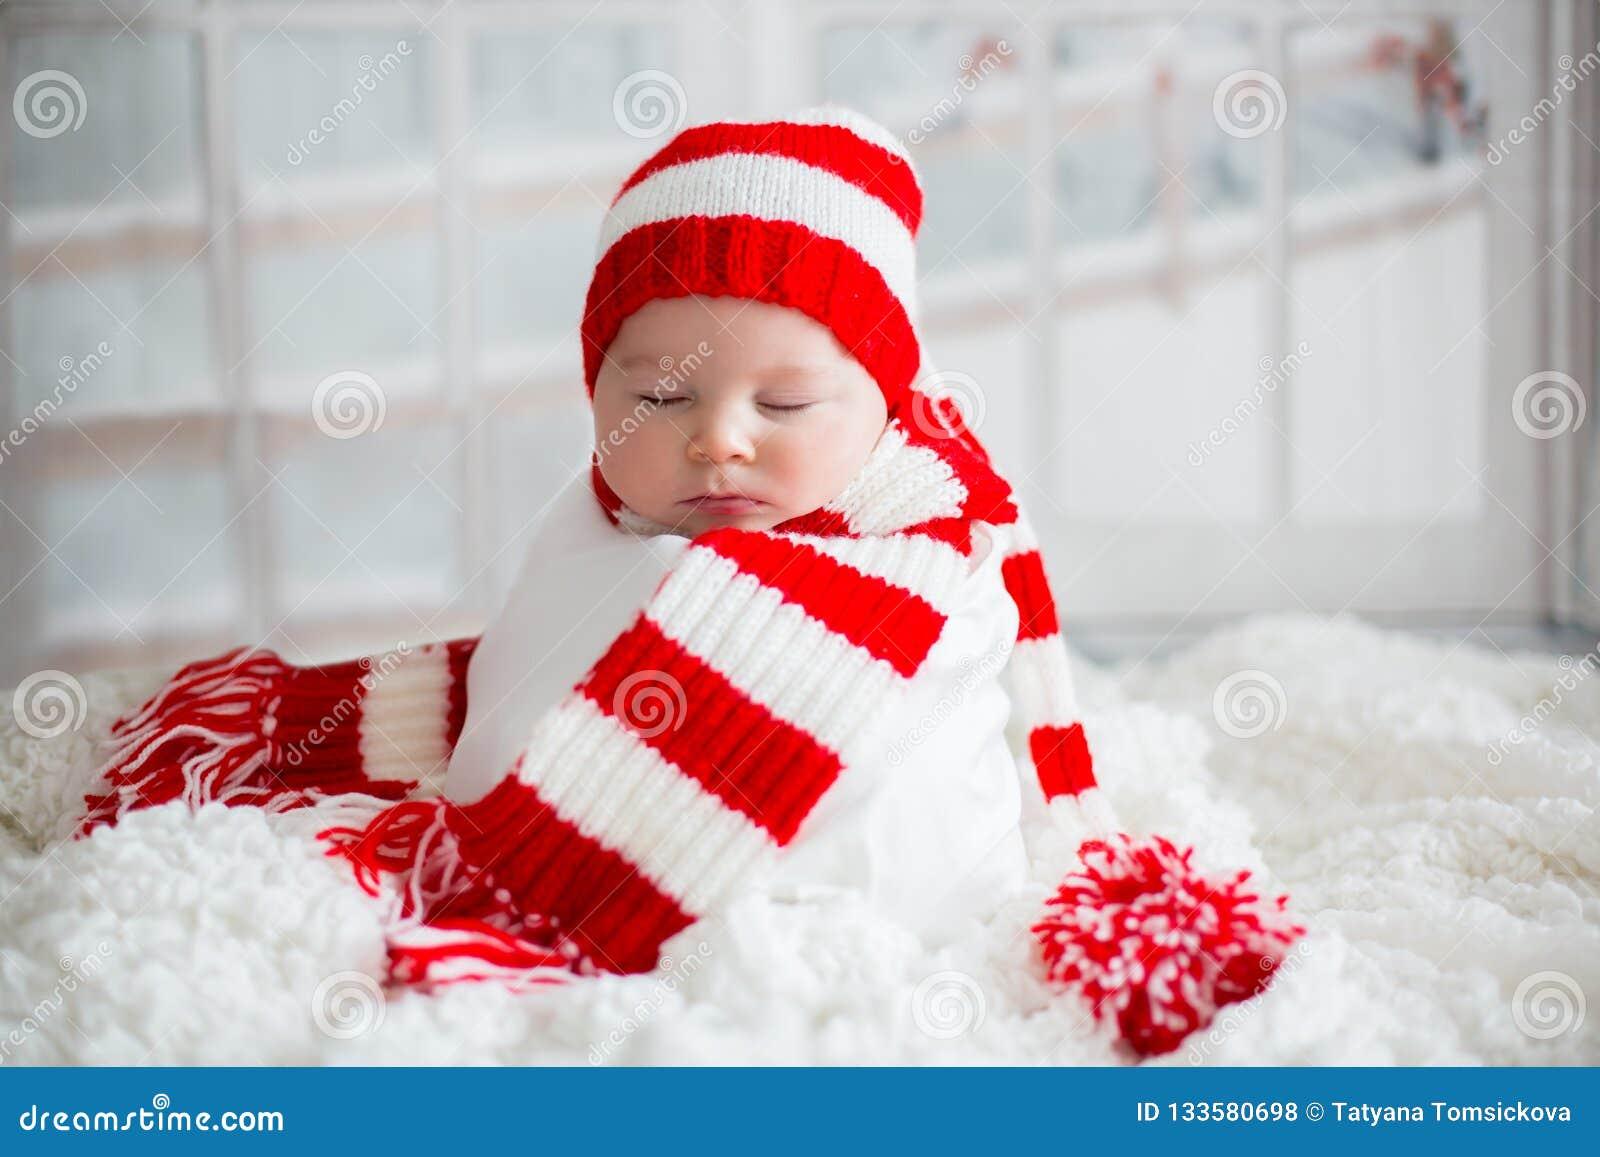 cbe9ada61 Christmas Portrait Of Cute Little Newborn Baby Boy, Wearing Sant ...